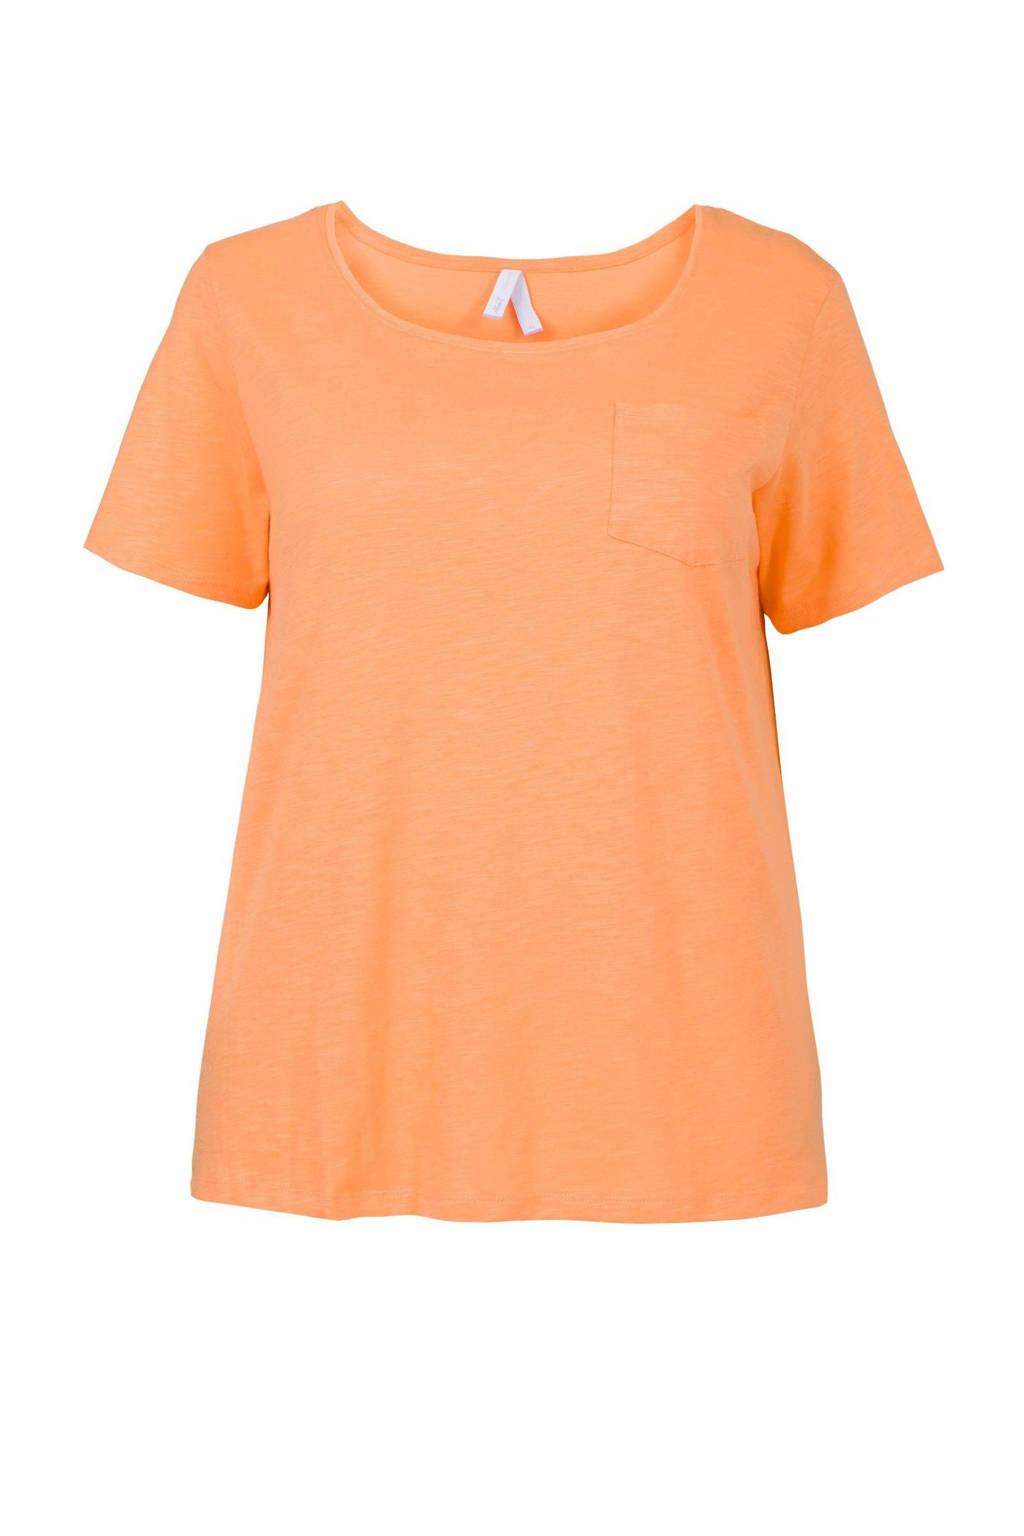 Miss Etam Plus T-shirt oranje, Oranje